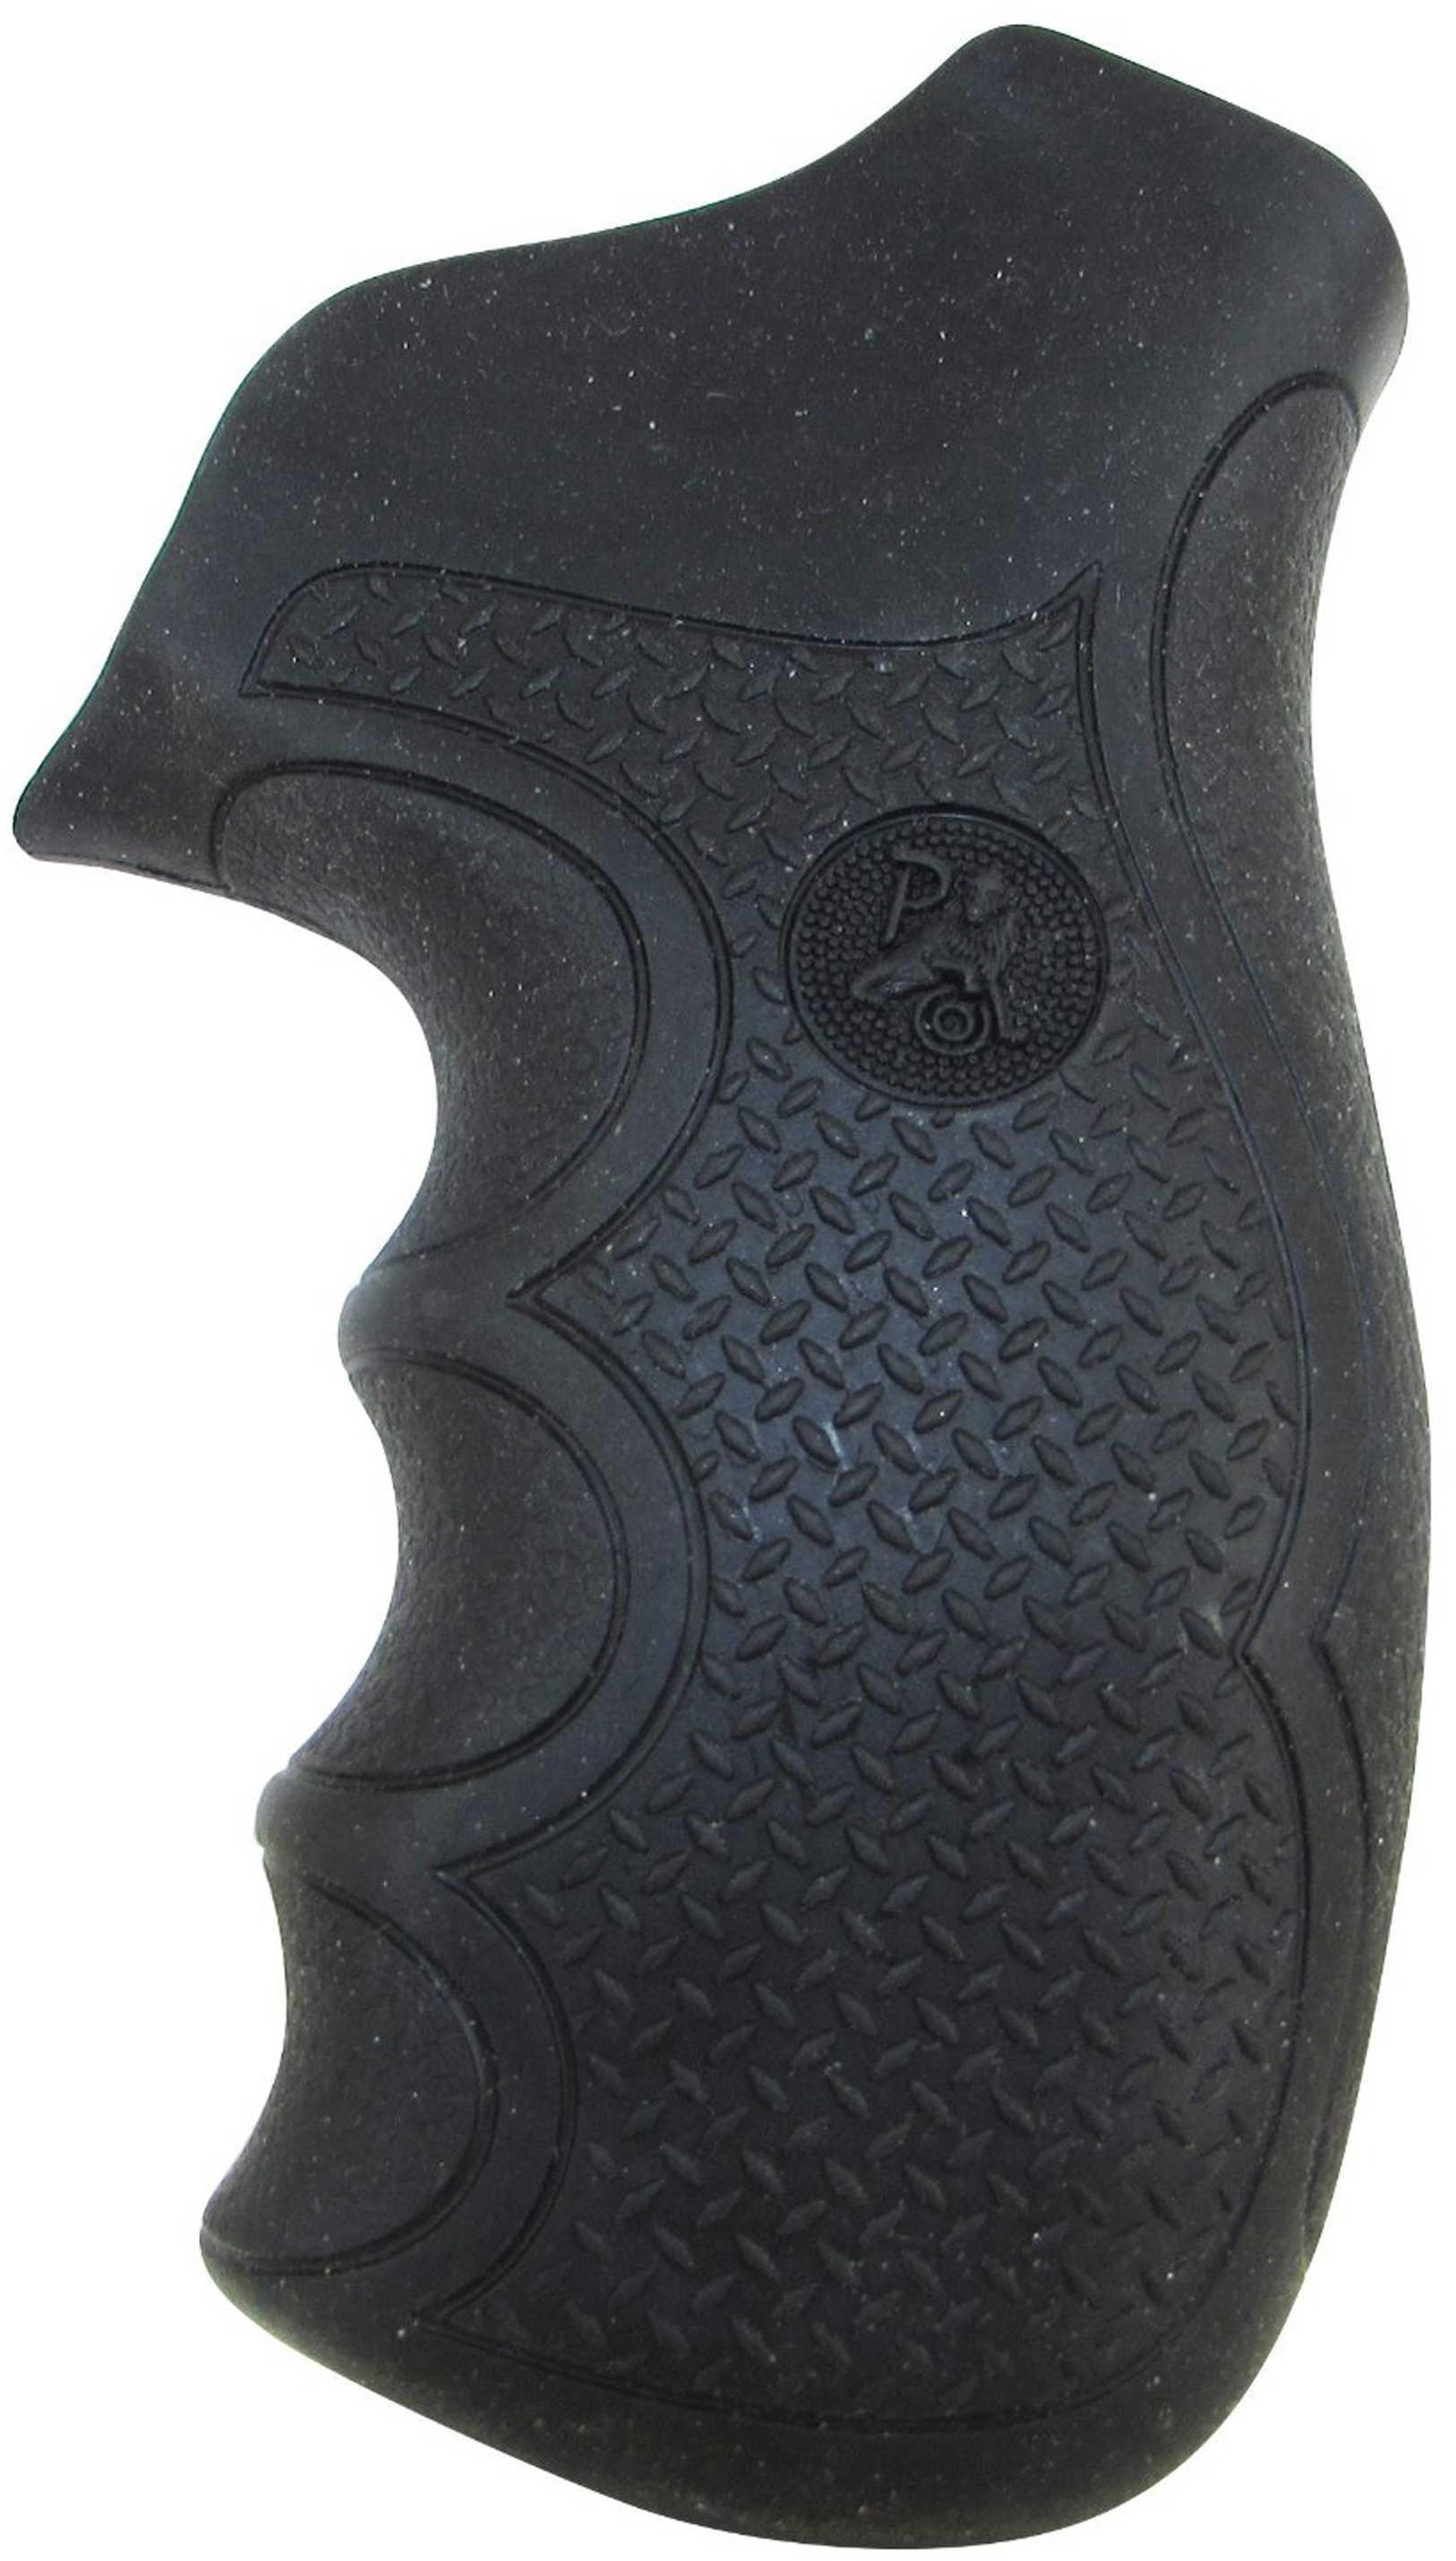 Pachmayr 02484 Diamond Pro Grip Ruger GP-100 Black Rubber